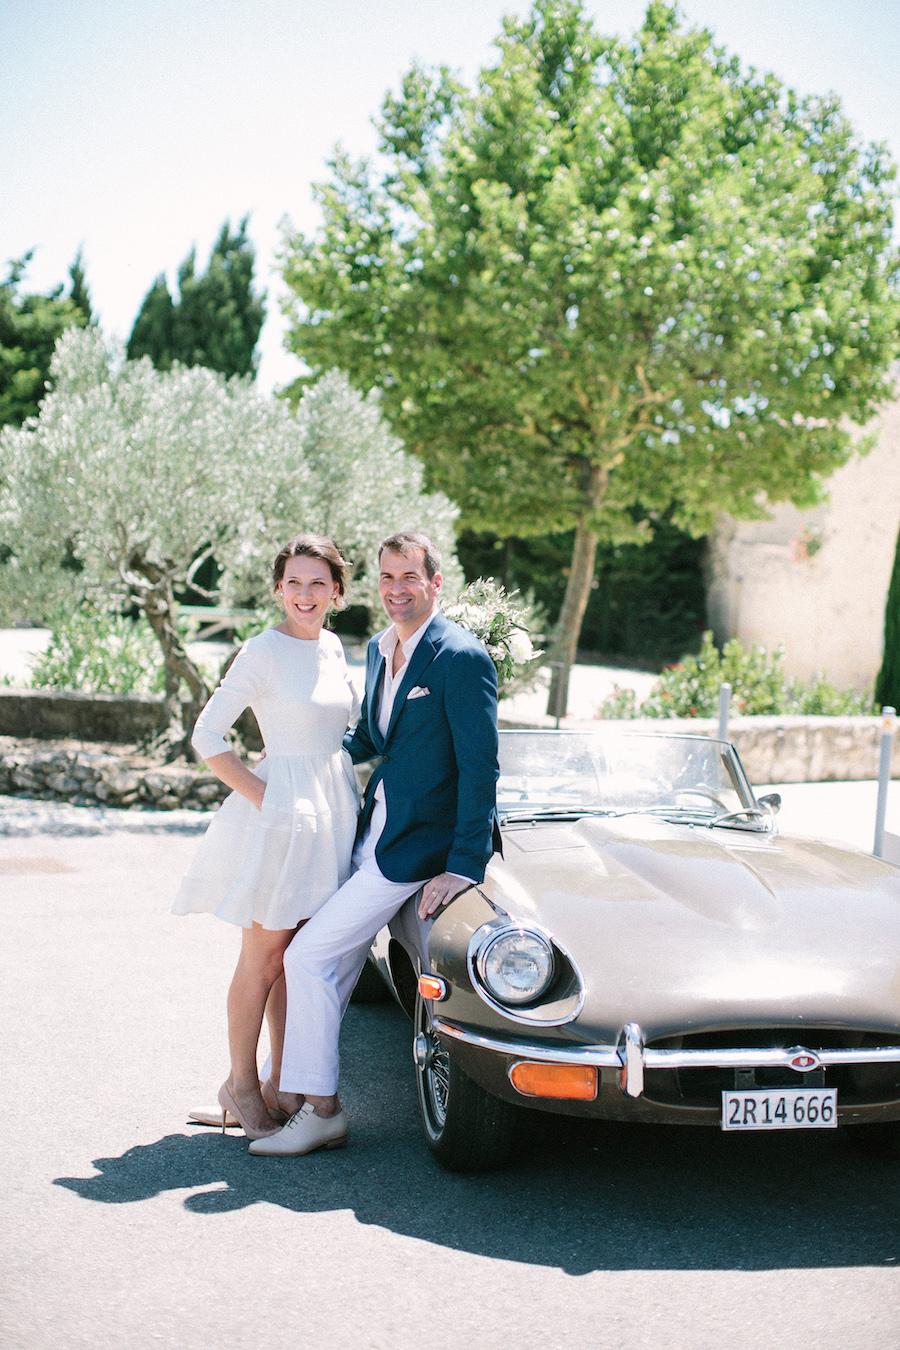 saya-photography-rustic-french-wedding-provence-domaines-de-patras-40.jpg